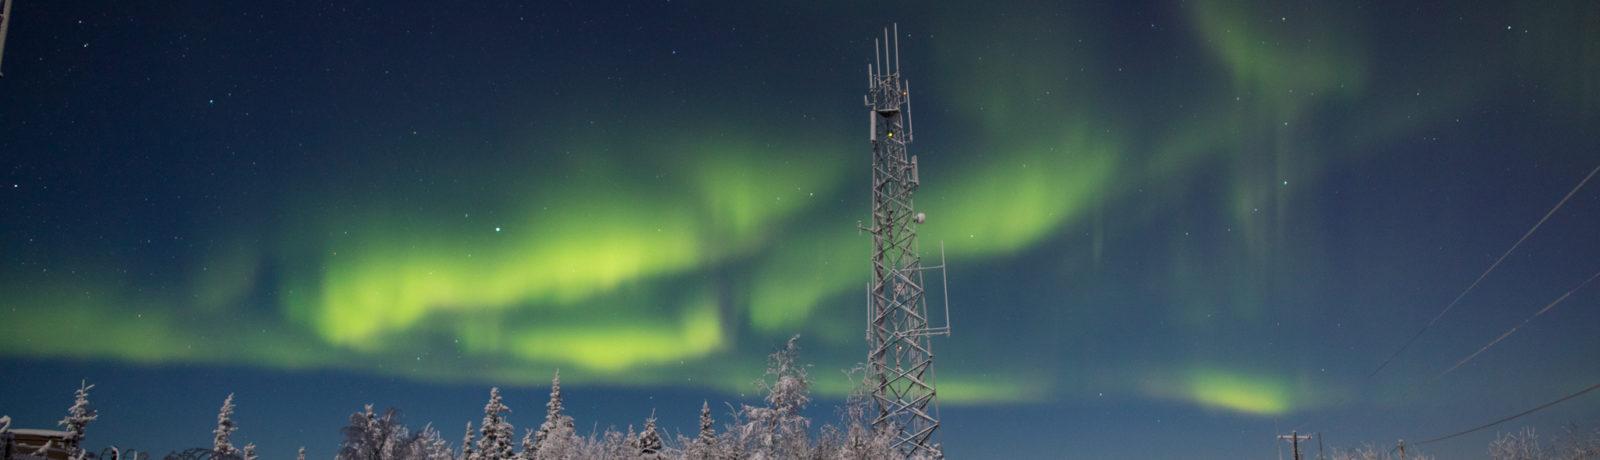 Polydrosos Weather Station